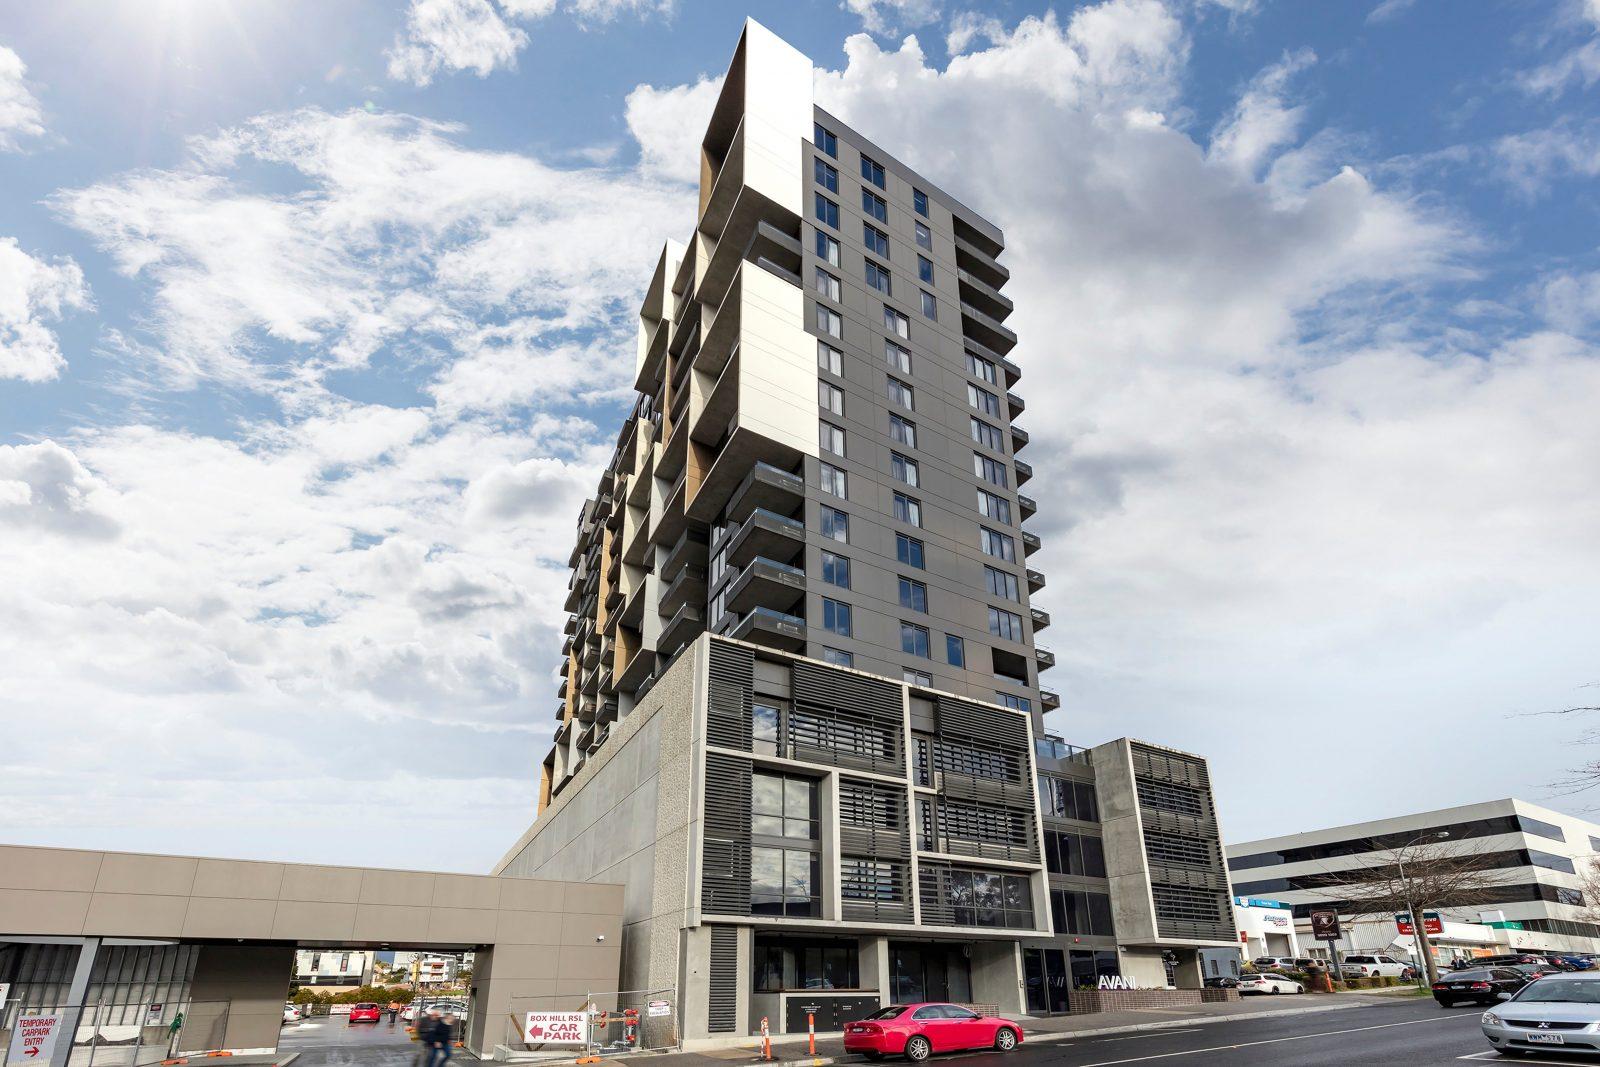 Avani Melbourne Box Hill Residences-Exterior-1-HR